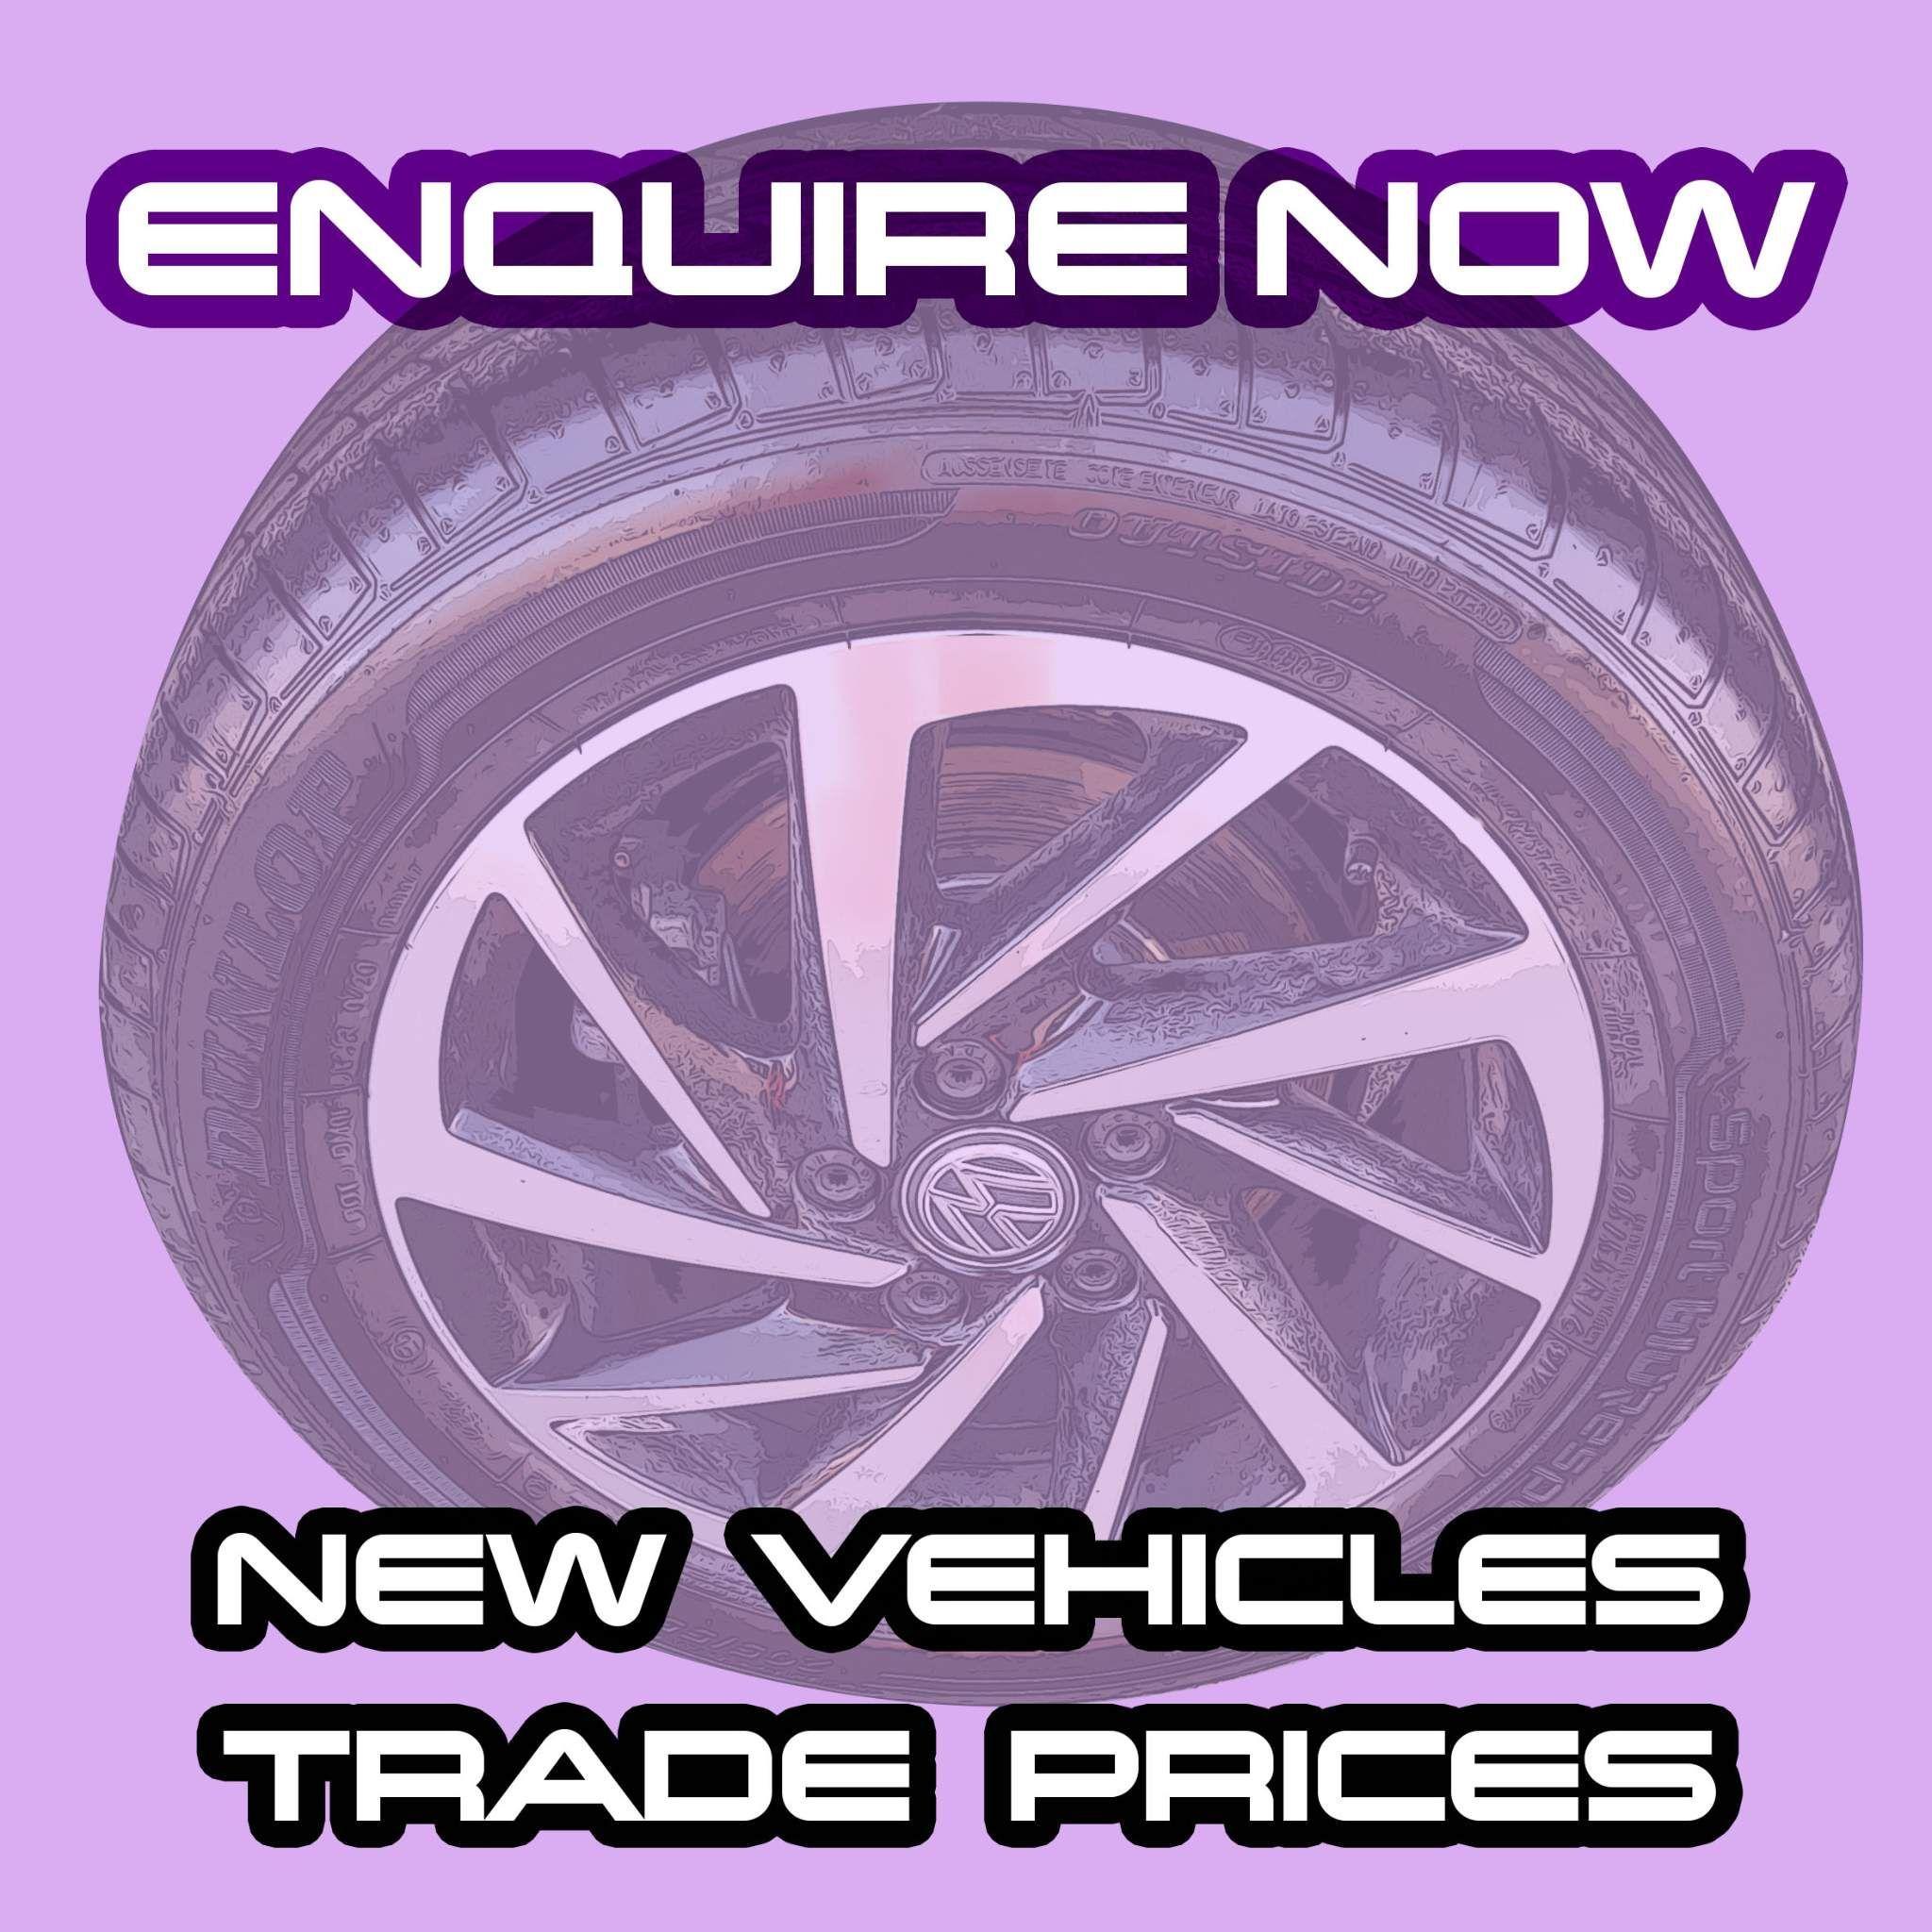 RenaultKangooML19 Business For Sale